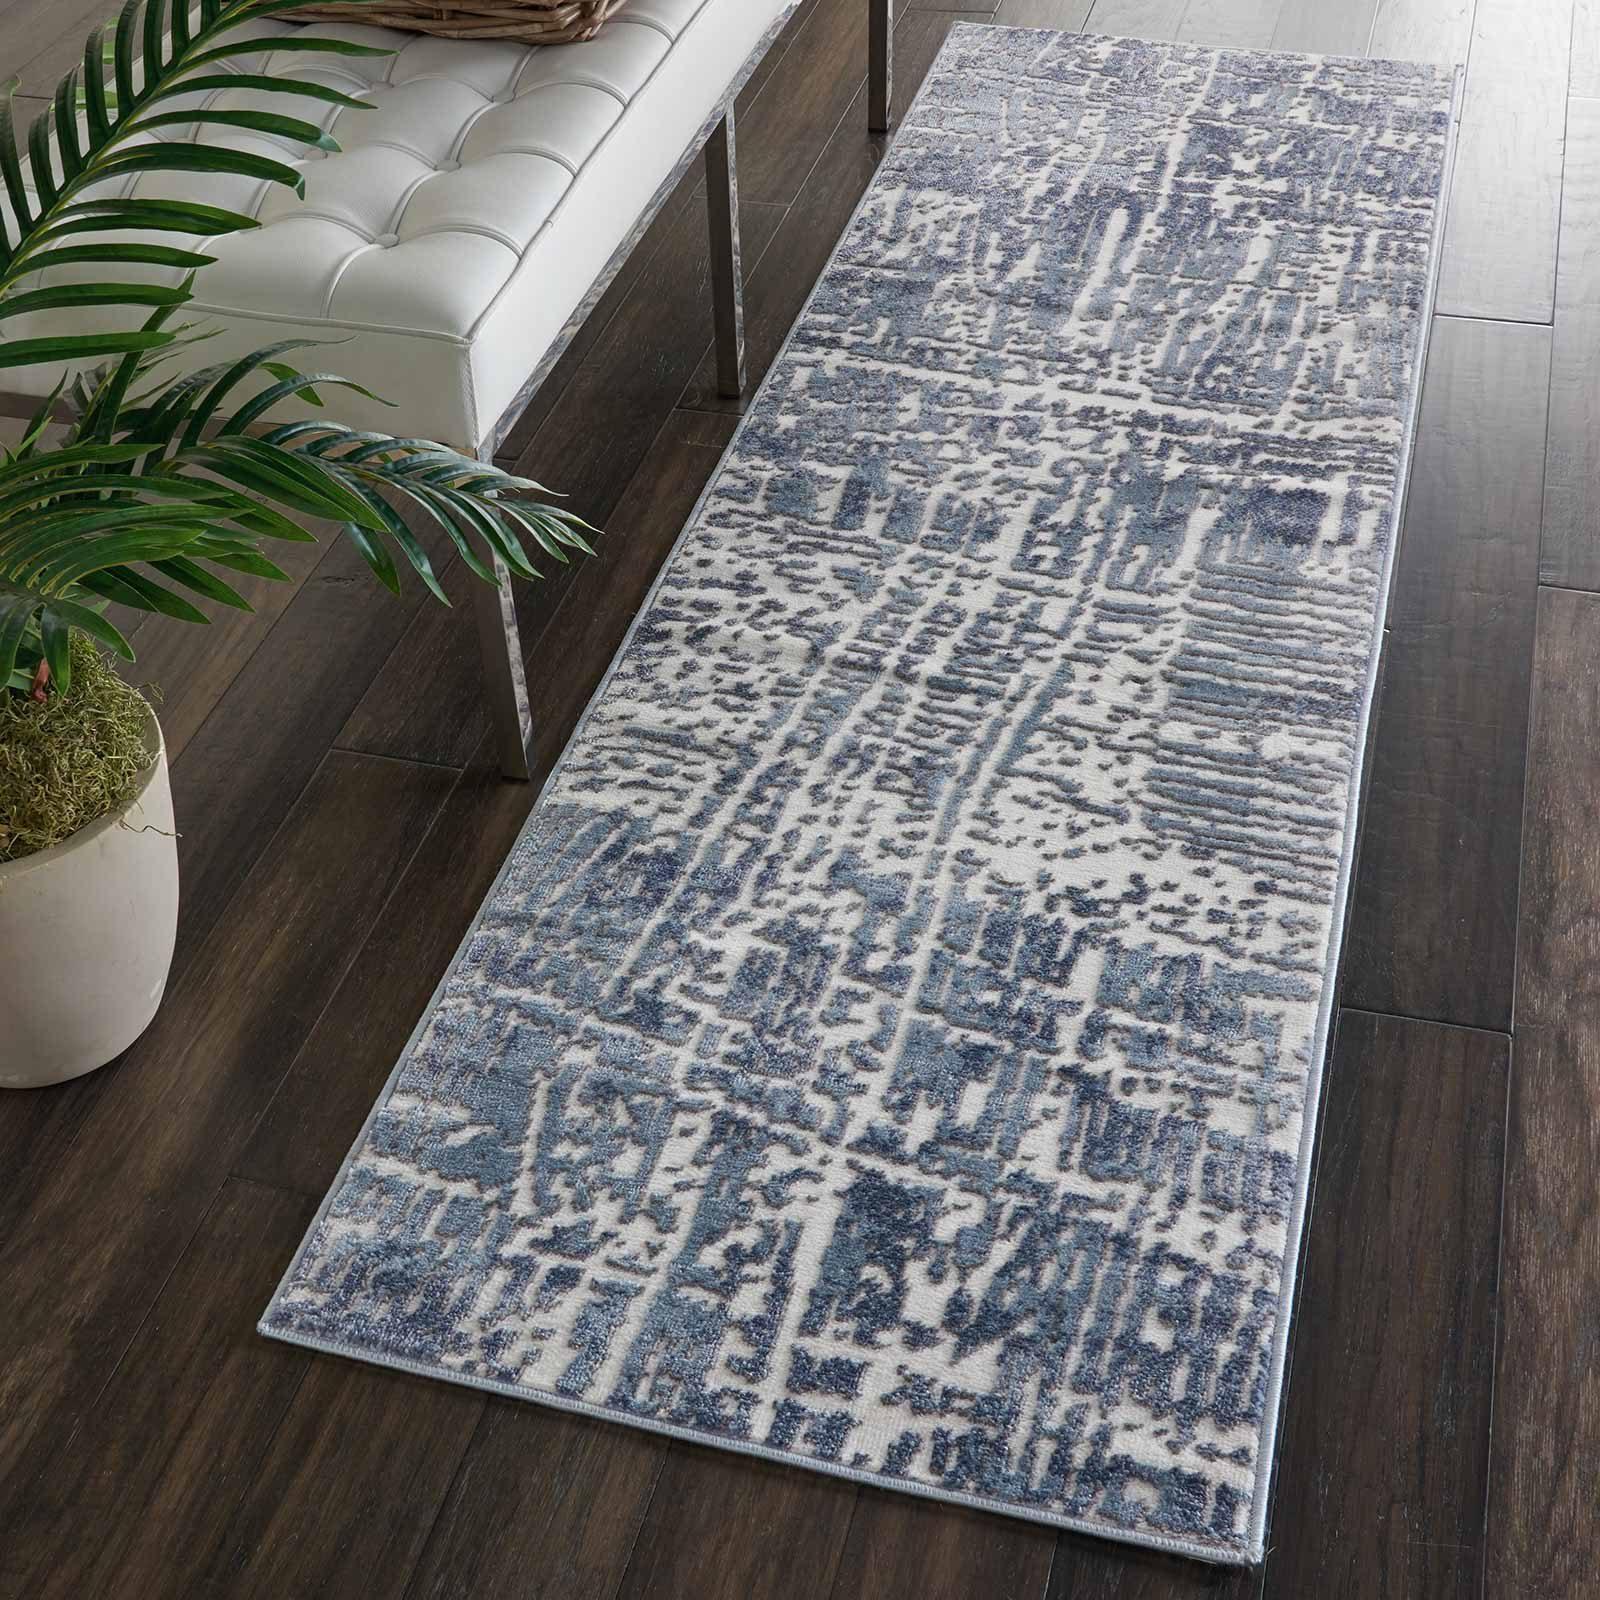 Nourison rug Urban Decor URD01 SLTIV 2X8 099446143549 interior 1 C